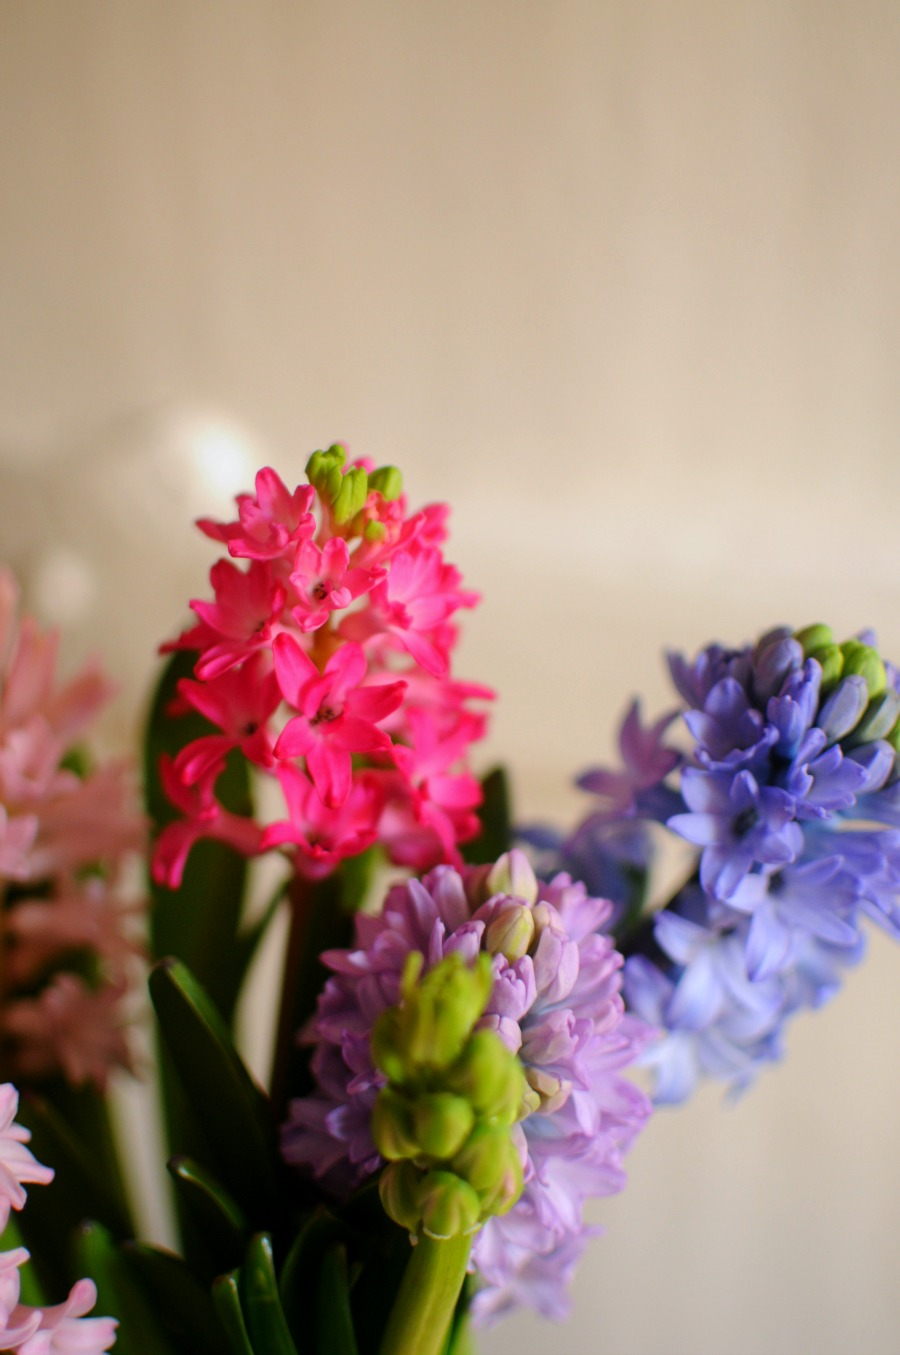 hyacinths january